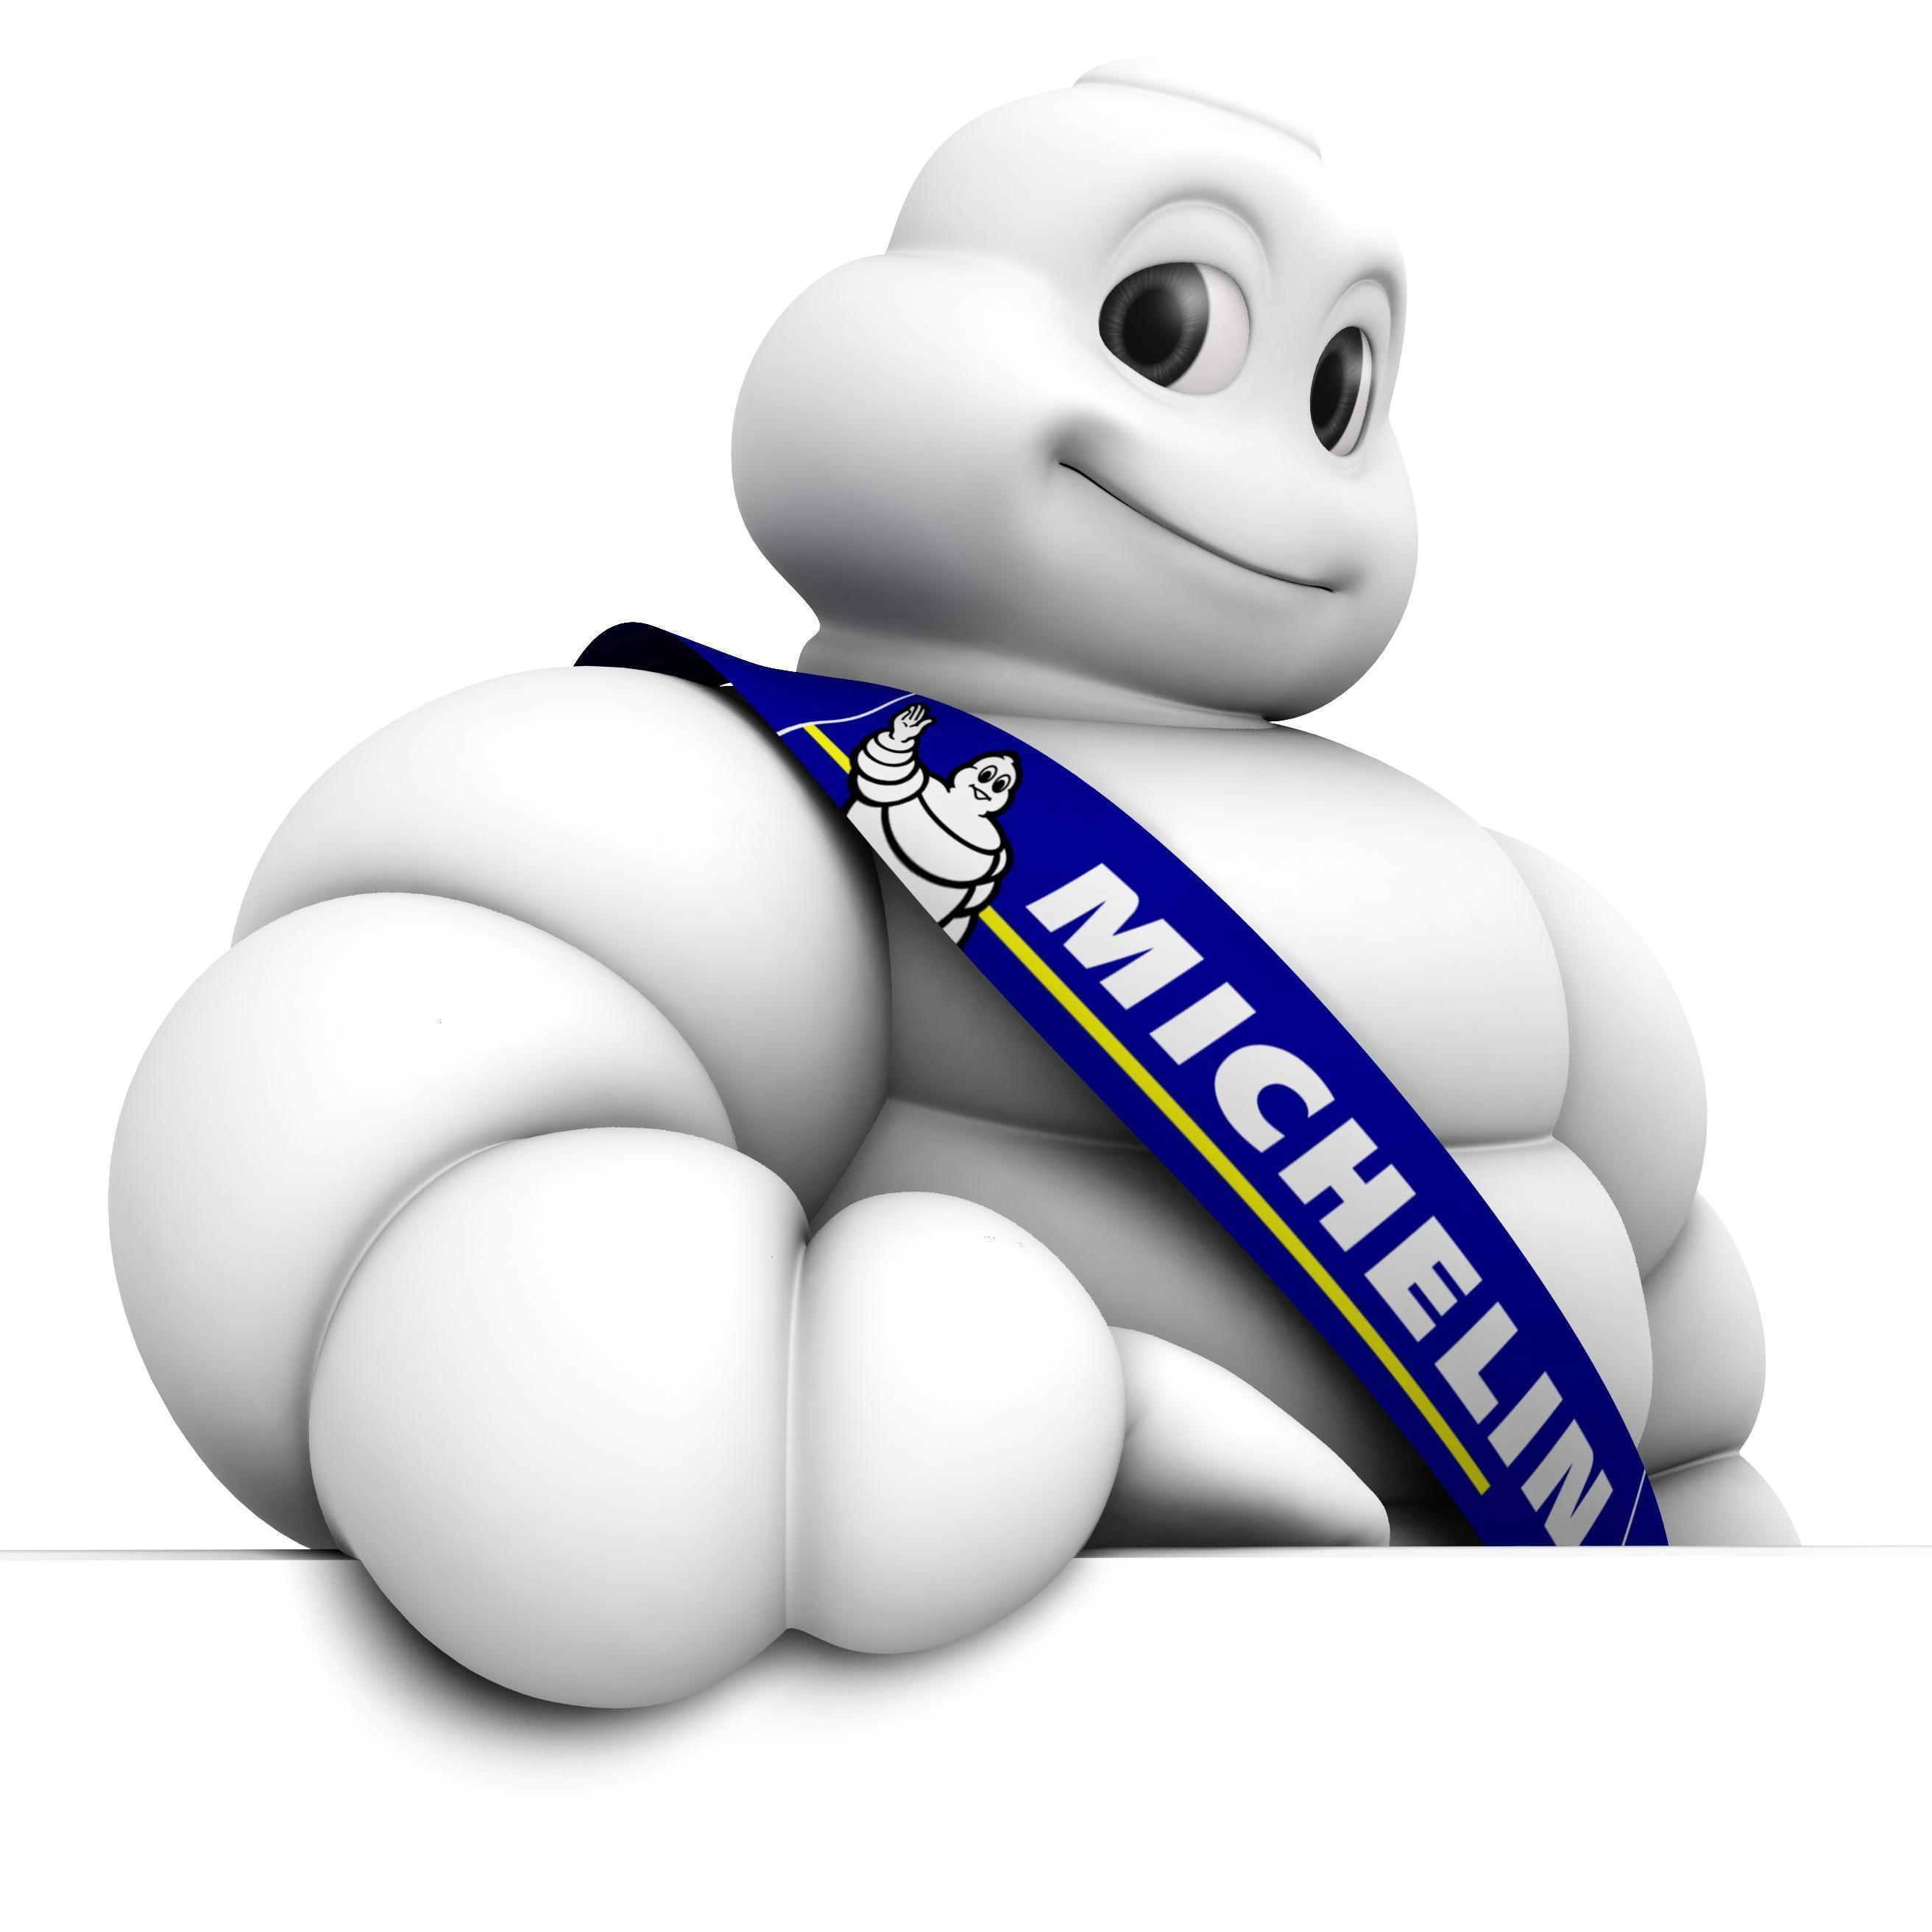 @Michelin_France